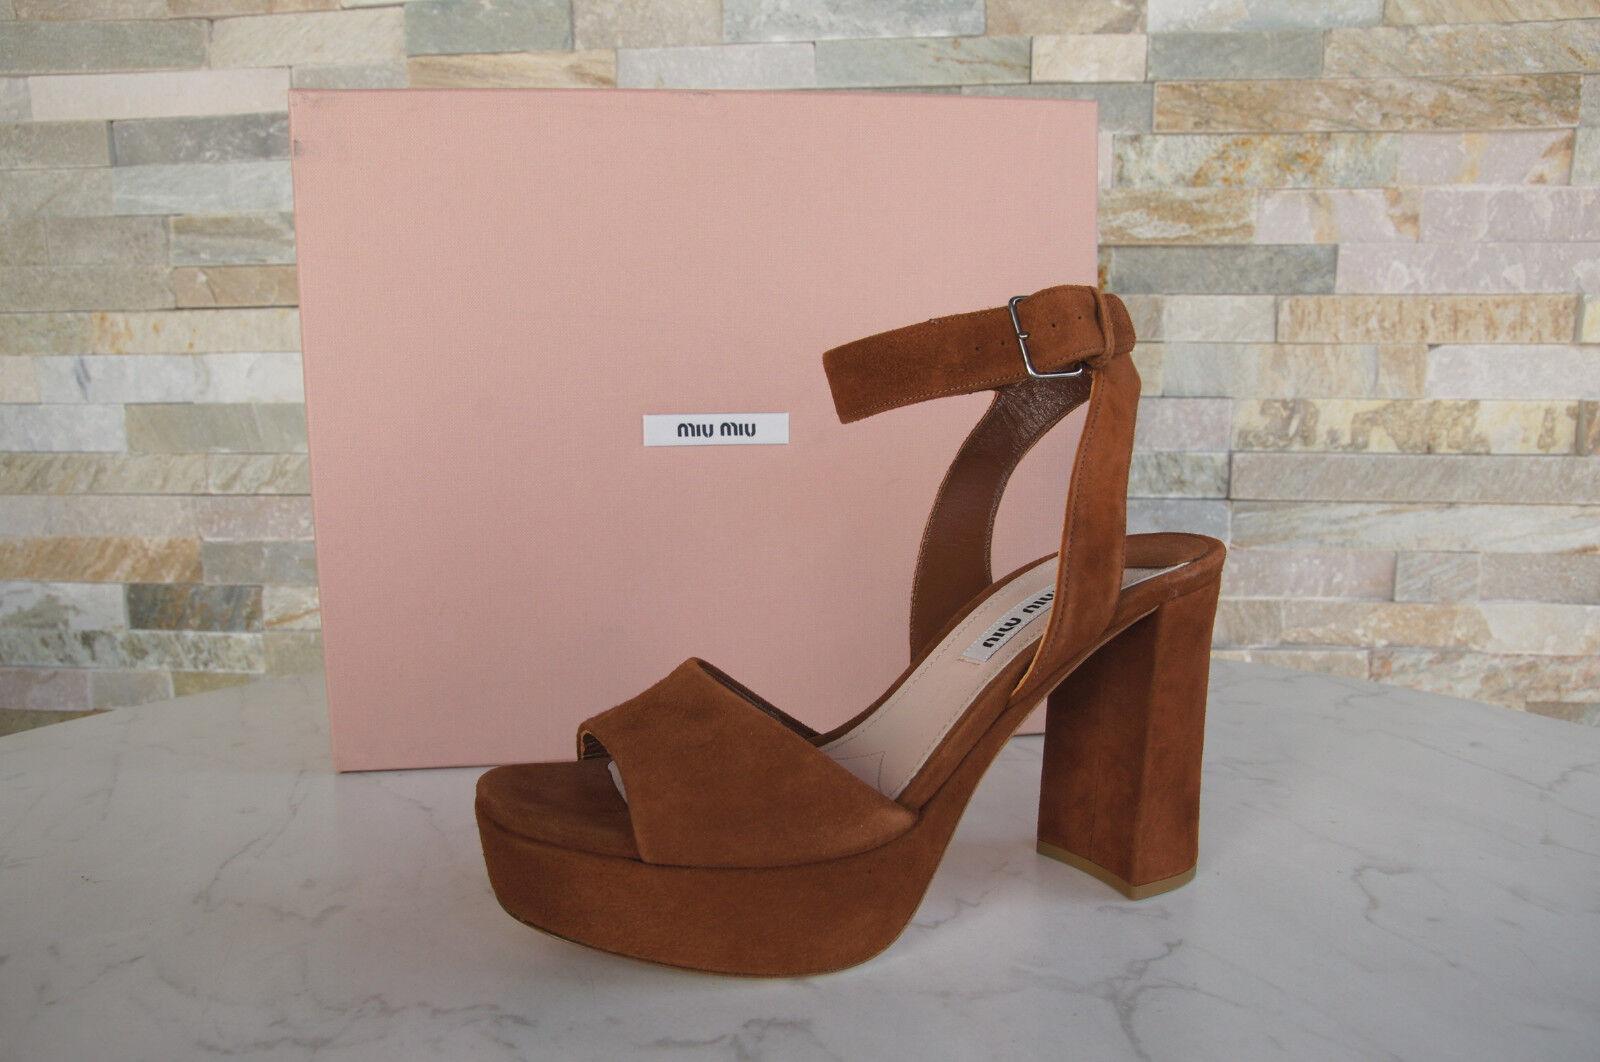 Descuento por tiempo limitado MIU MIU Gr 36 Plateau Sandaletten sandals Schuhe braun palisander NEU  UVP 490 '